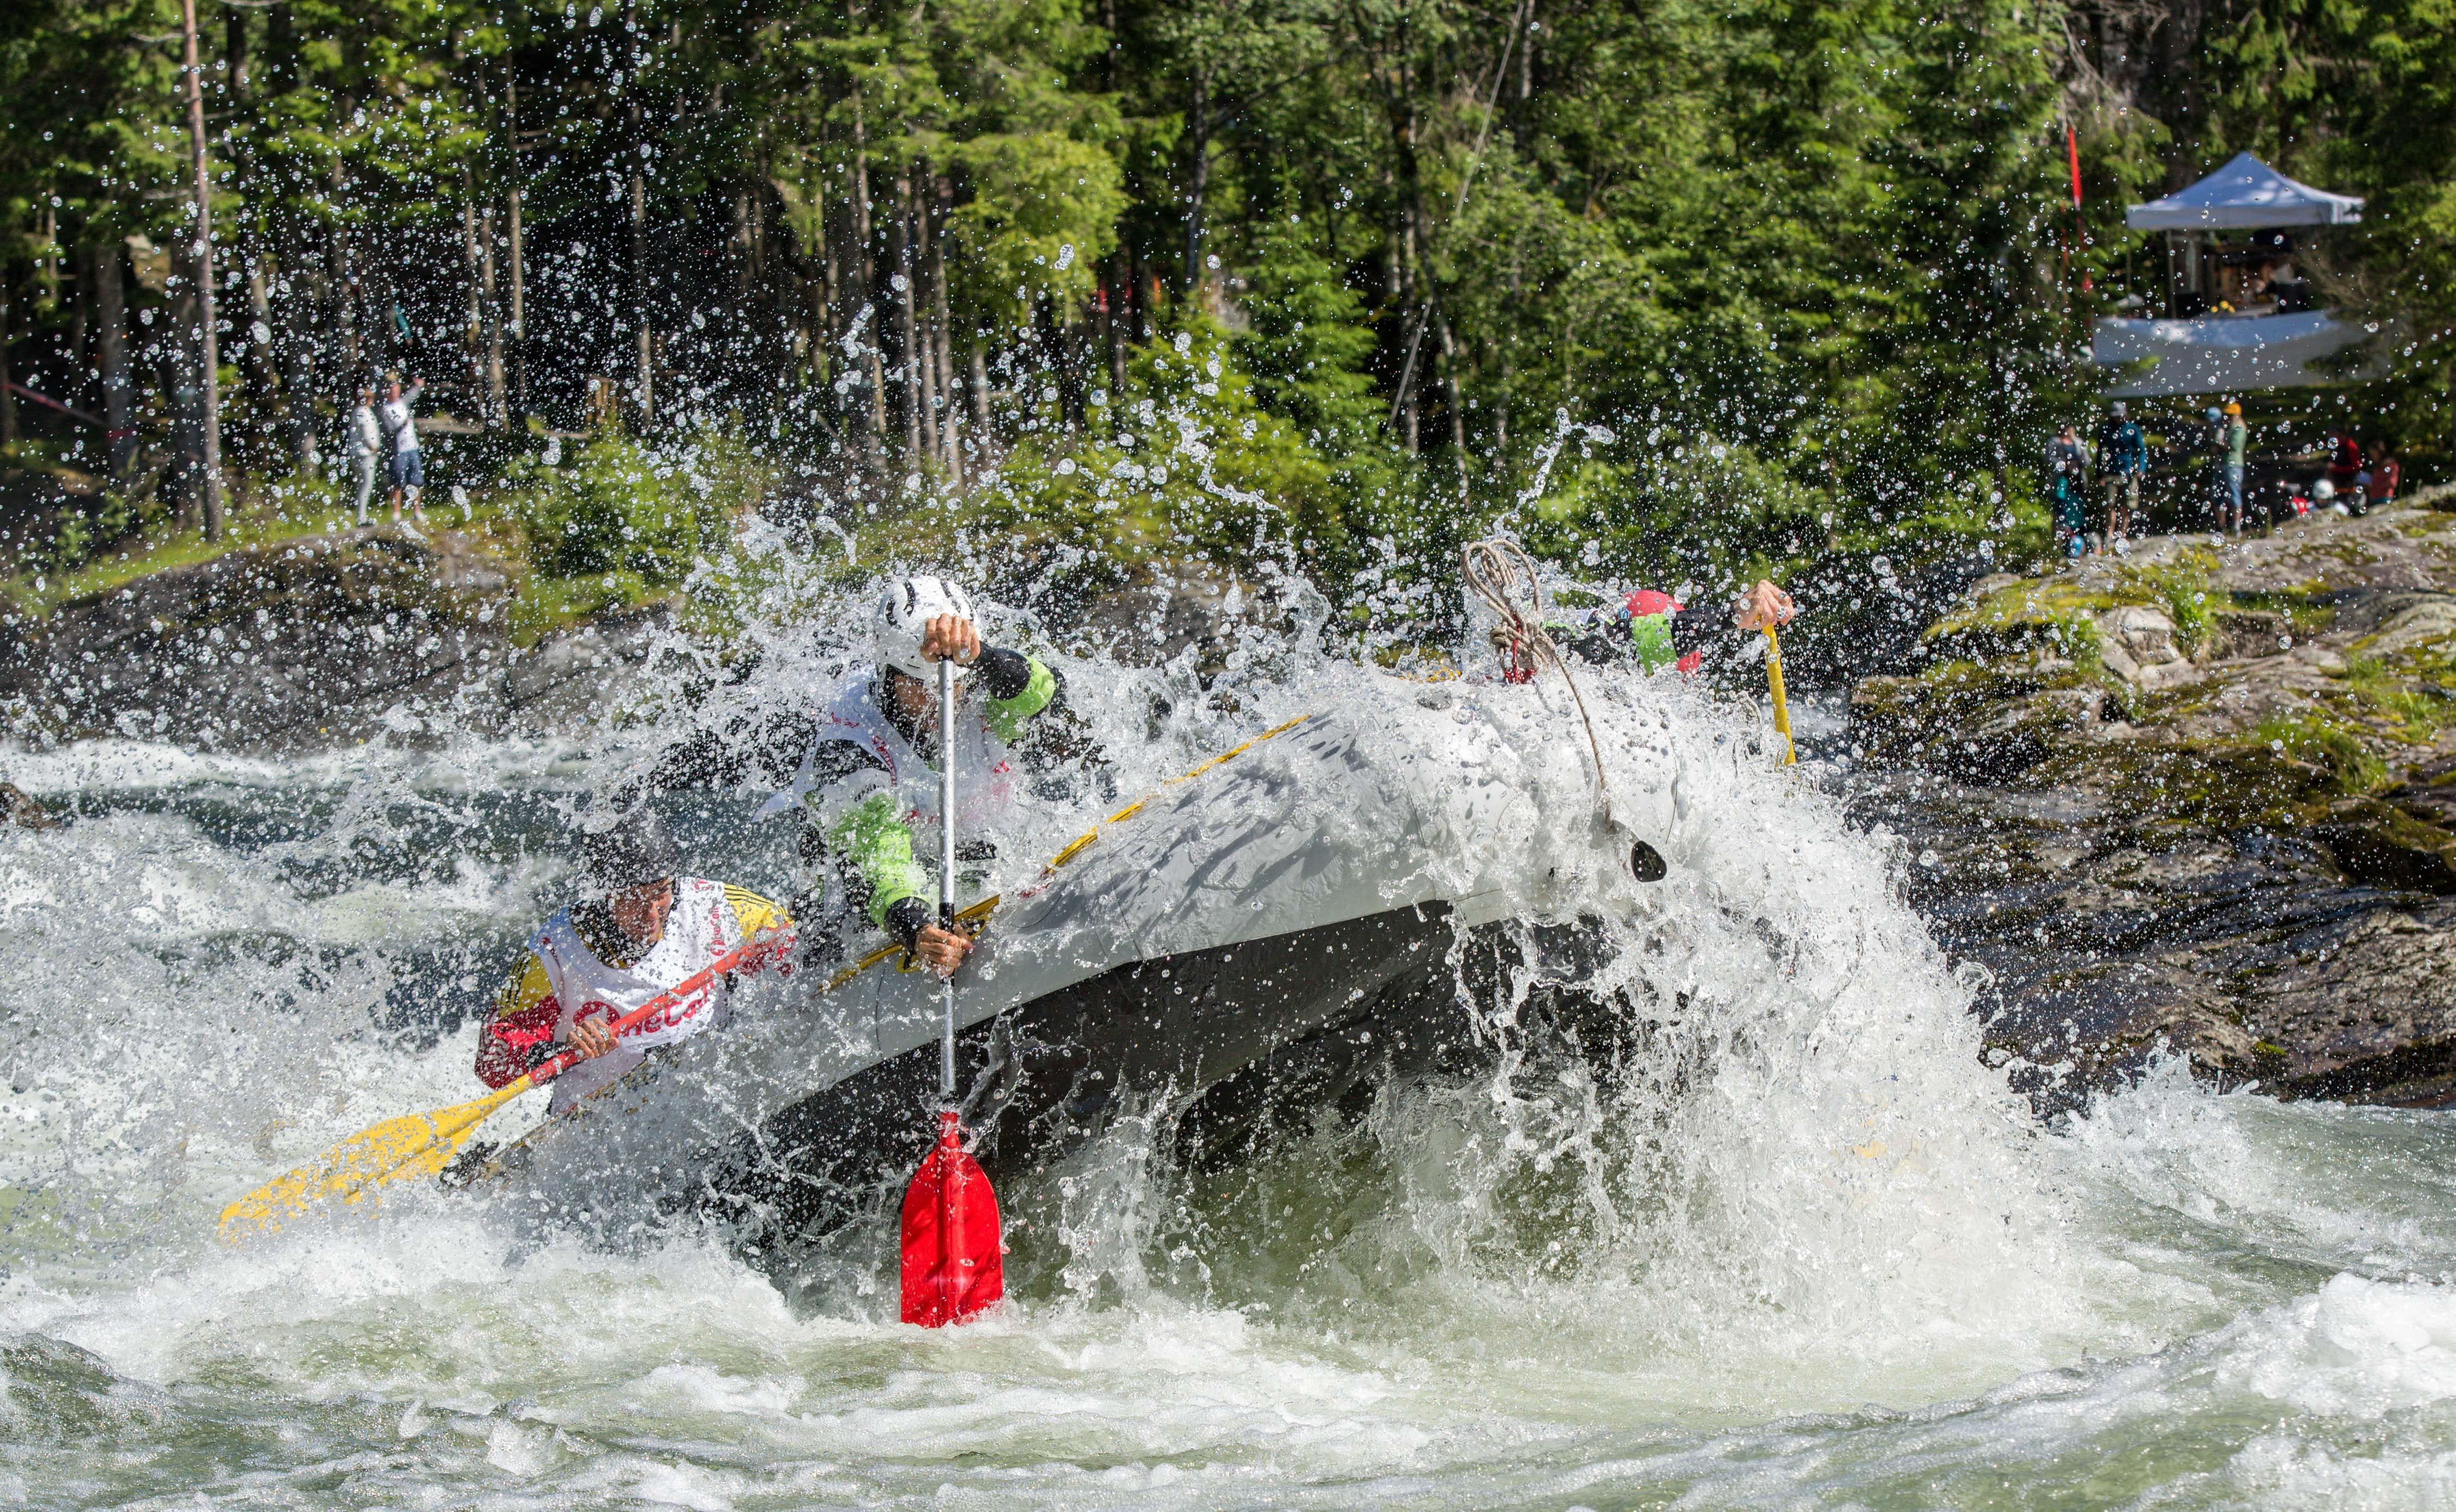 River_Rafting Swiss Actvities